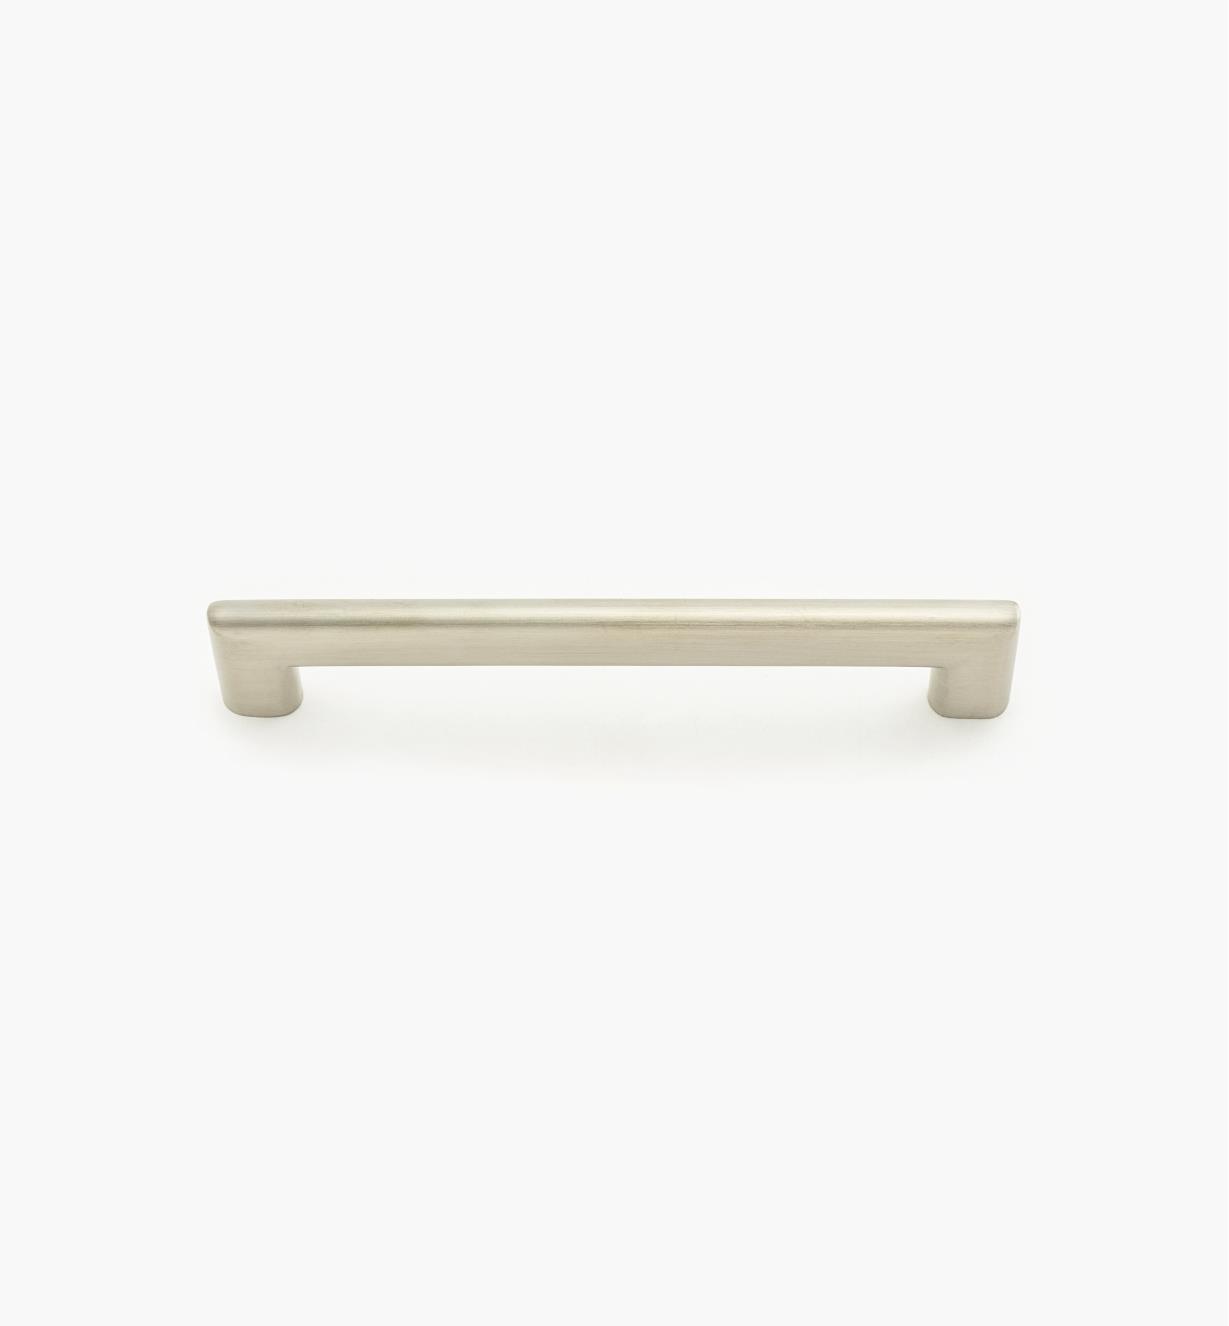 01W8024 - Poignée tubulaire ovale, 192mm